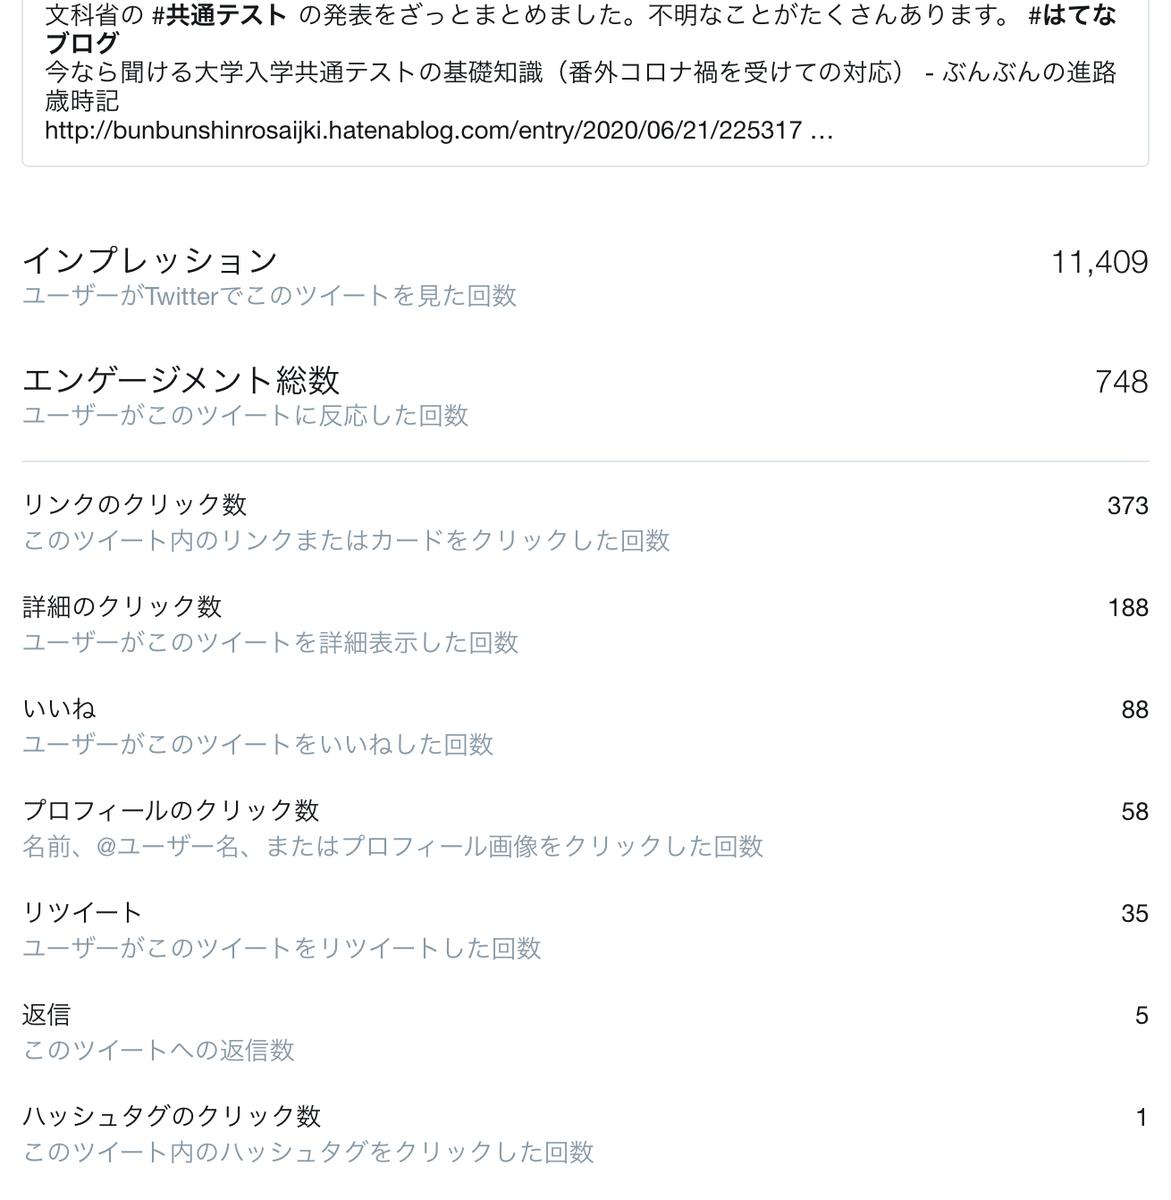 f:id:tokoyakanbannet:20200629201054j:plain